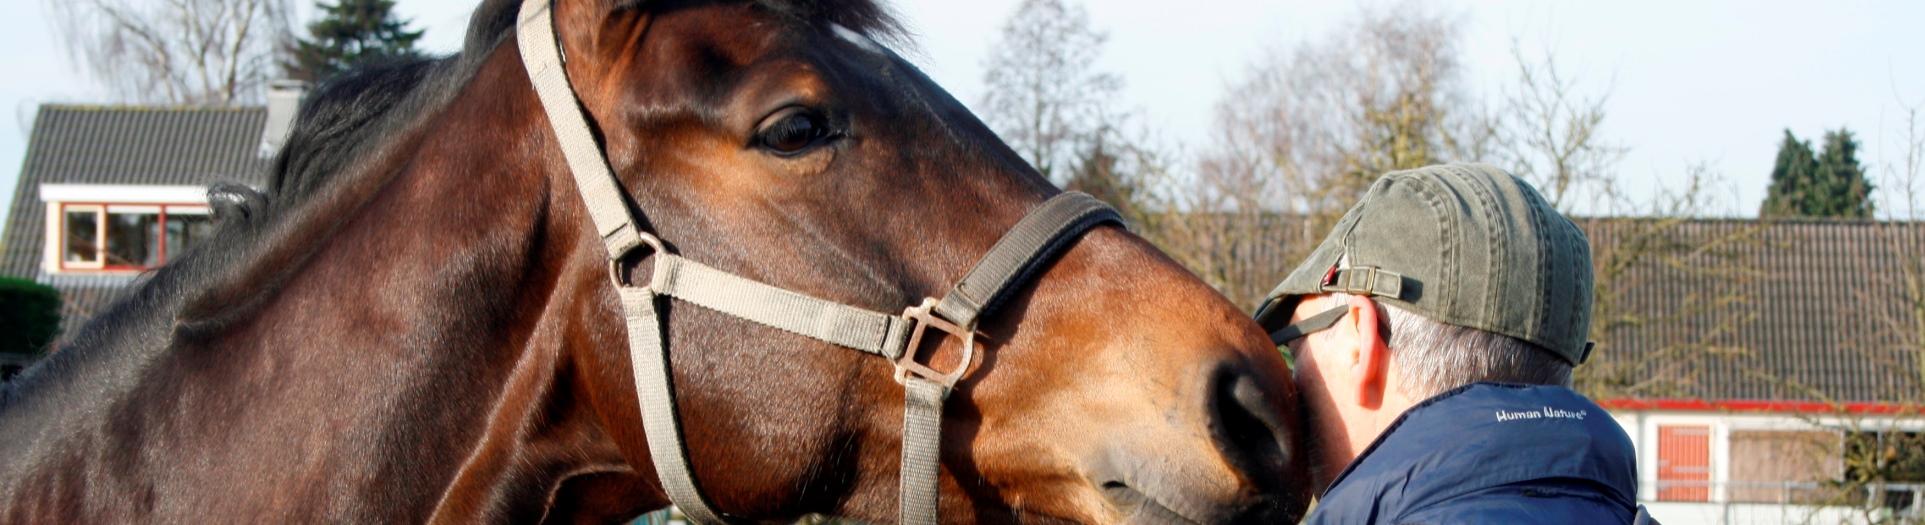 Contact - Horse Power Life Power